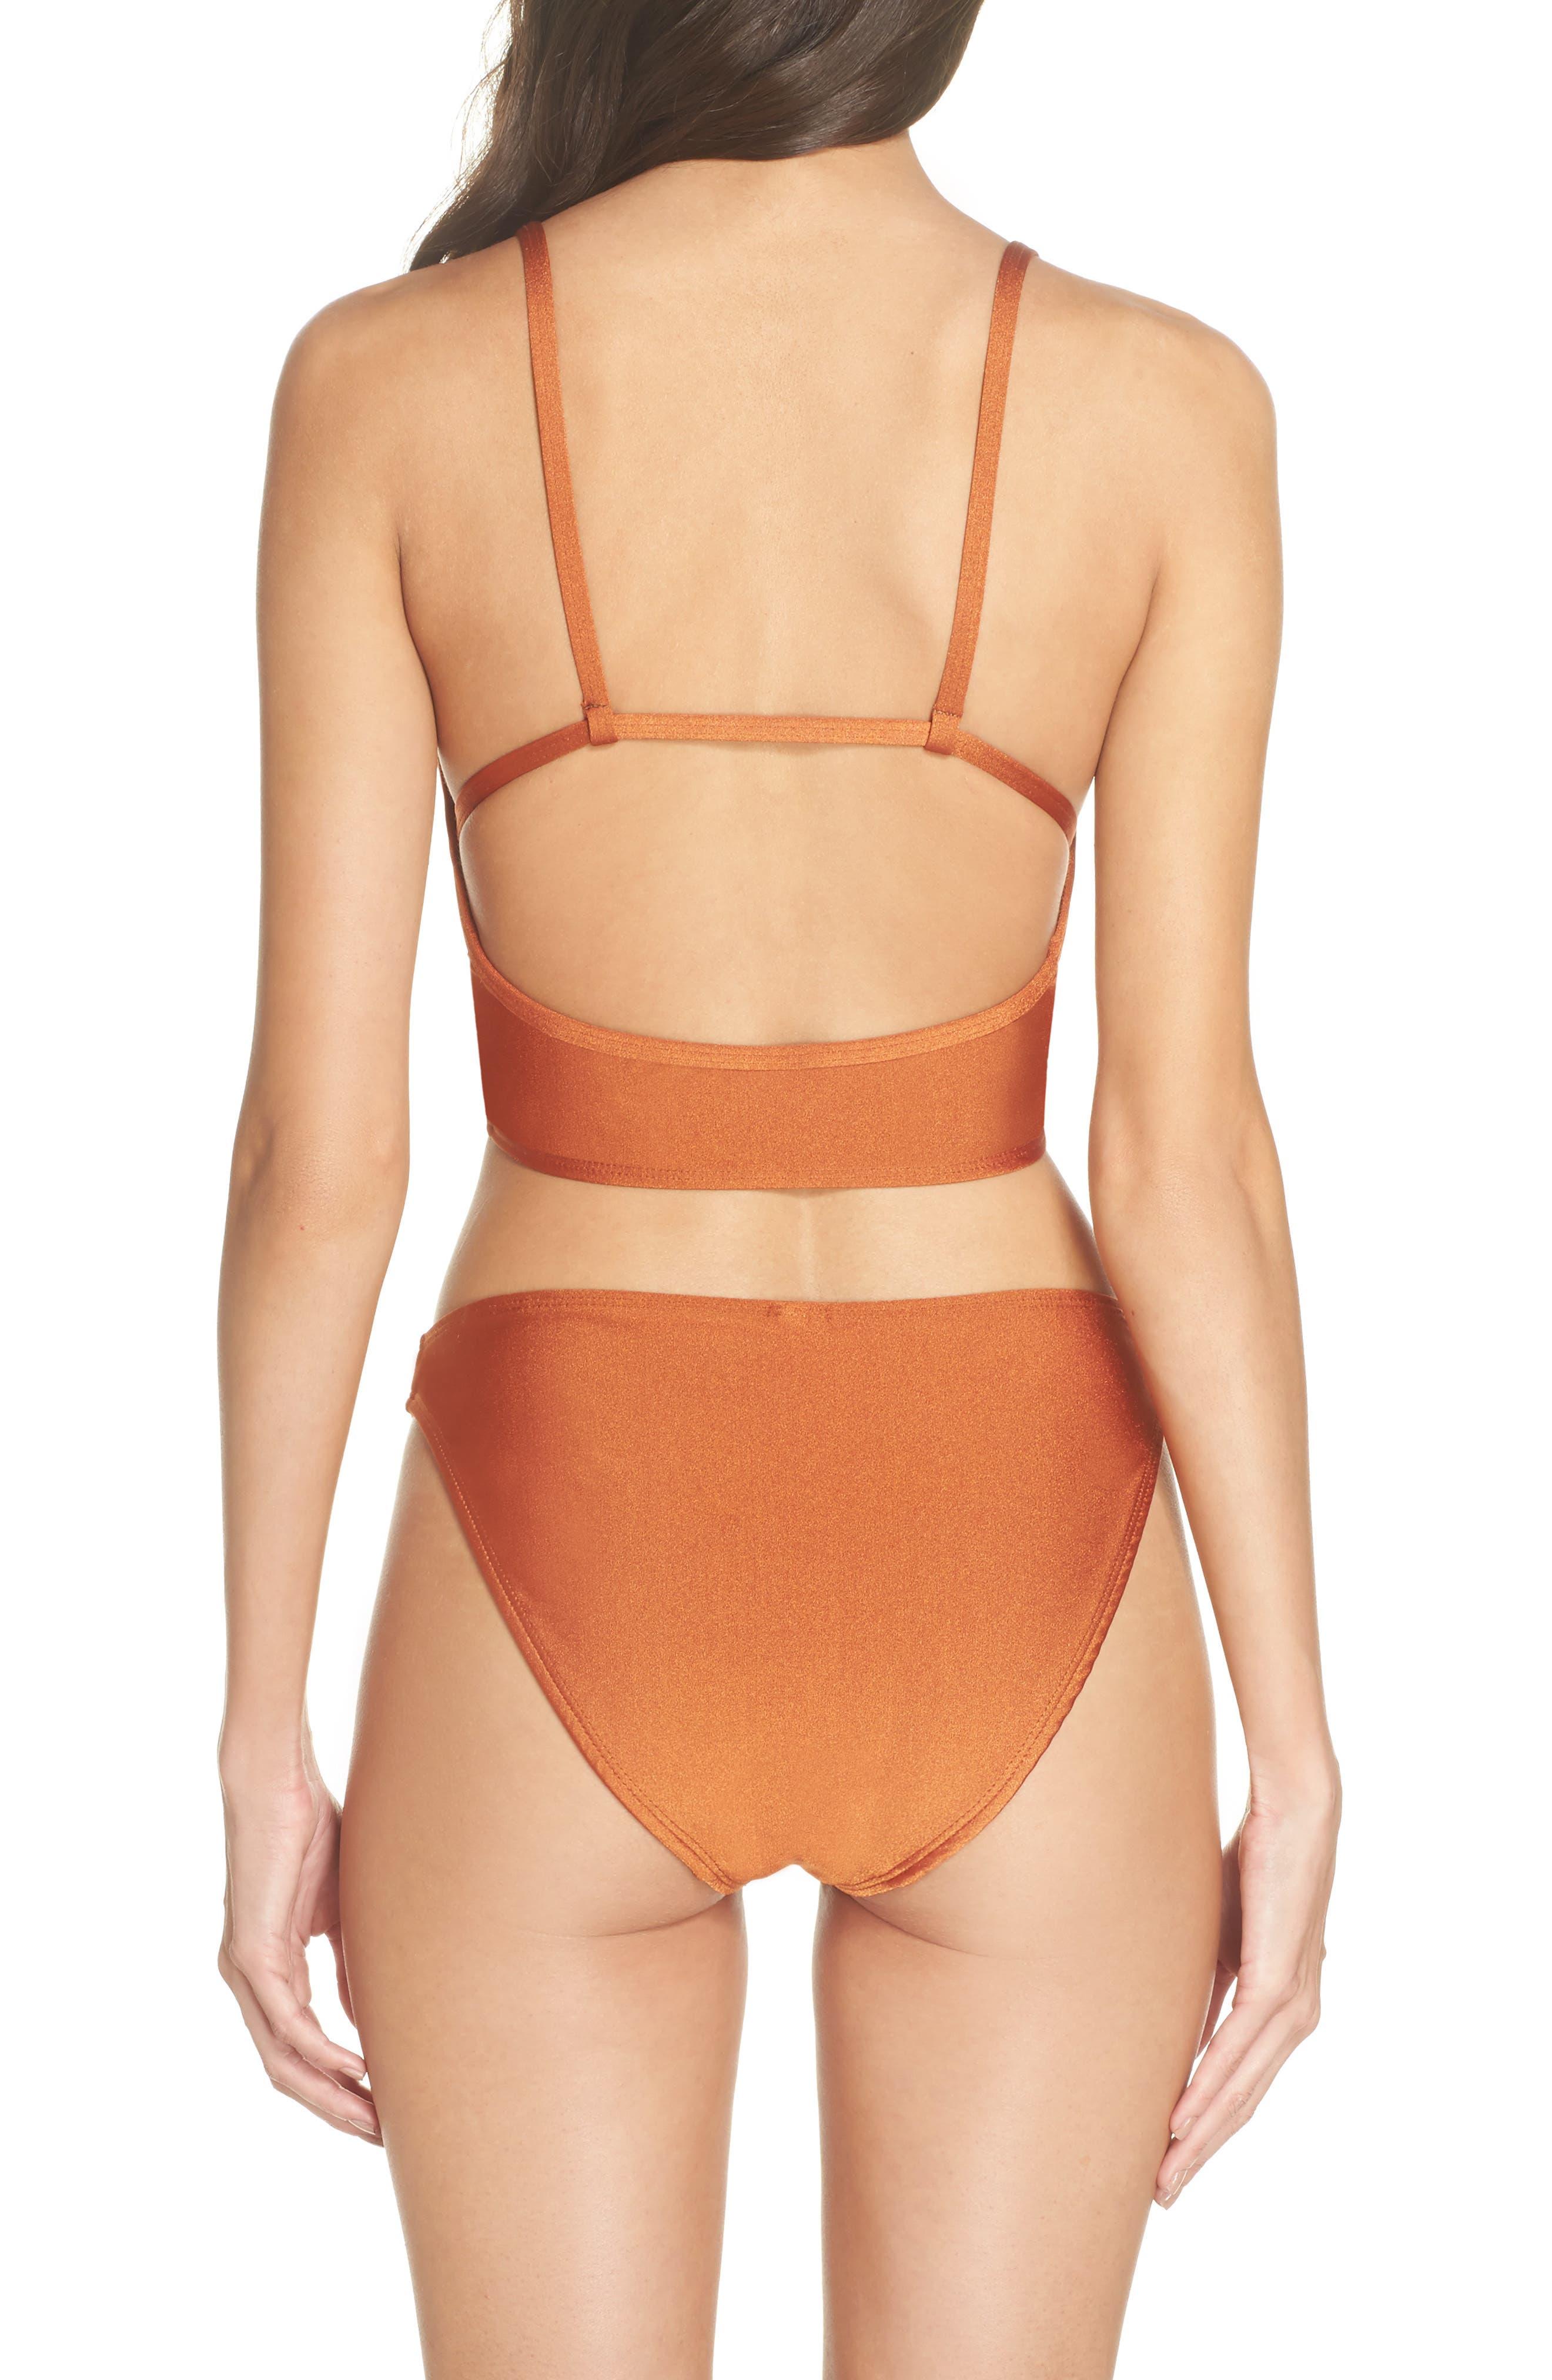 Horizon Bikini Top,                             Alternate thumbnail 6, color,                             Ginger Orange